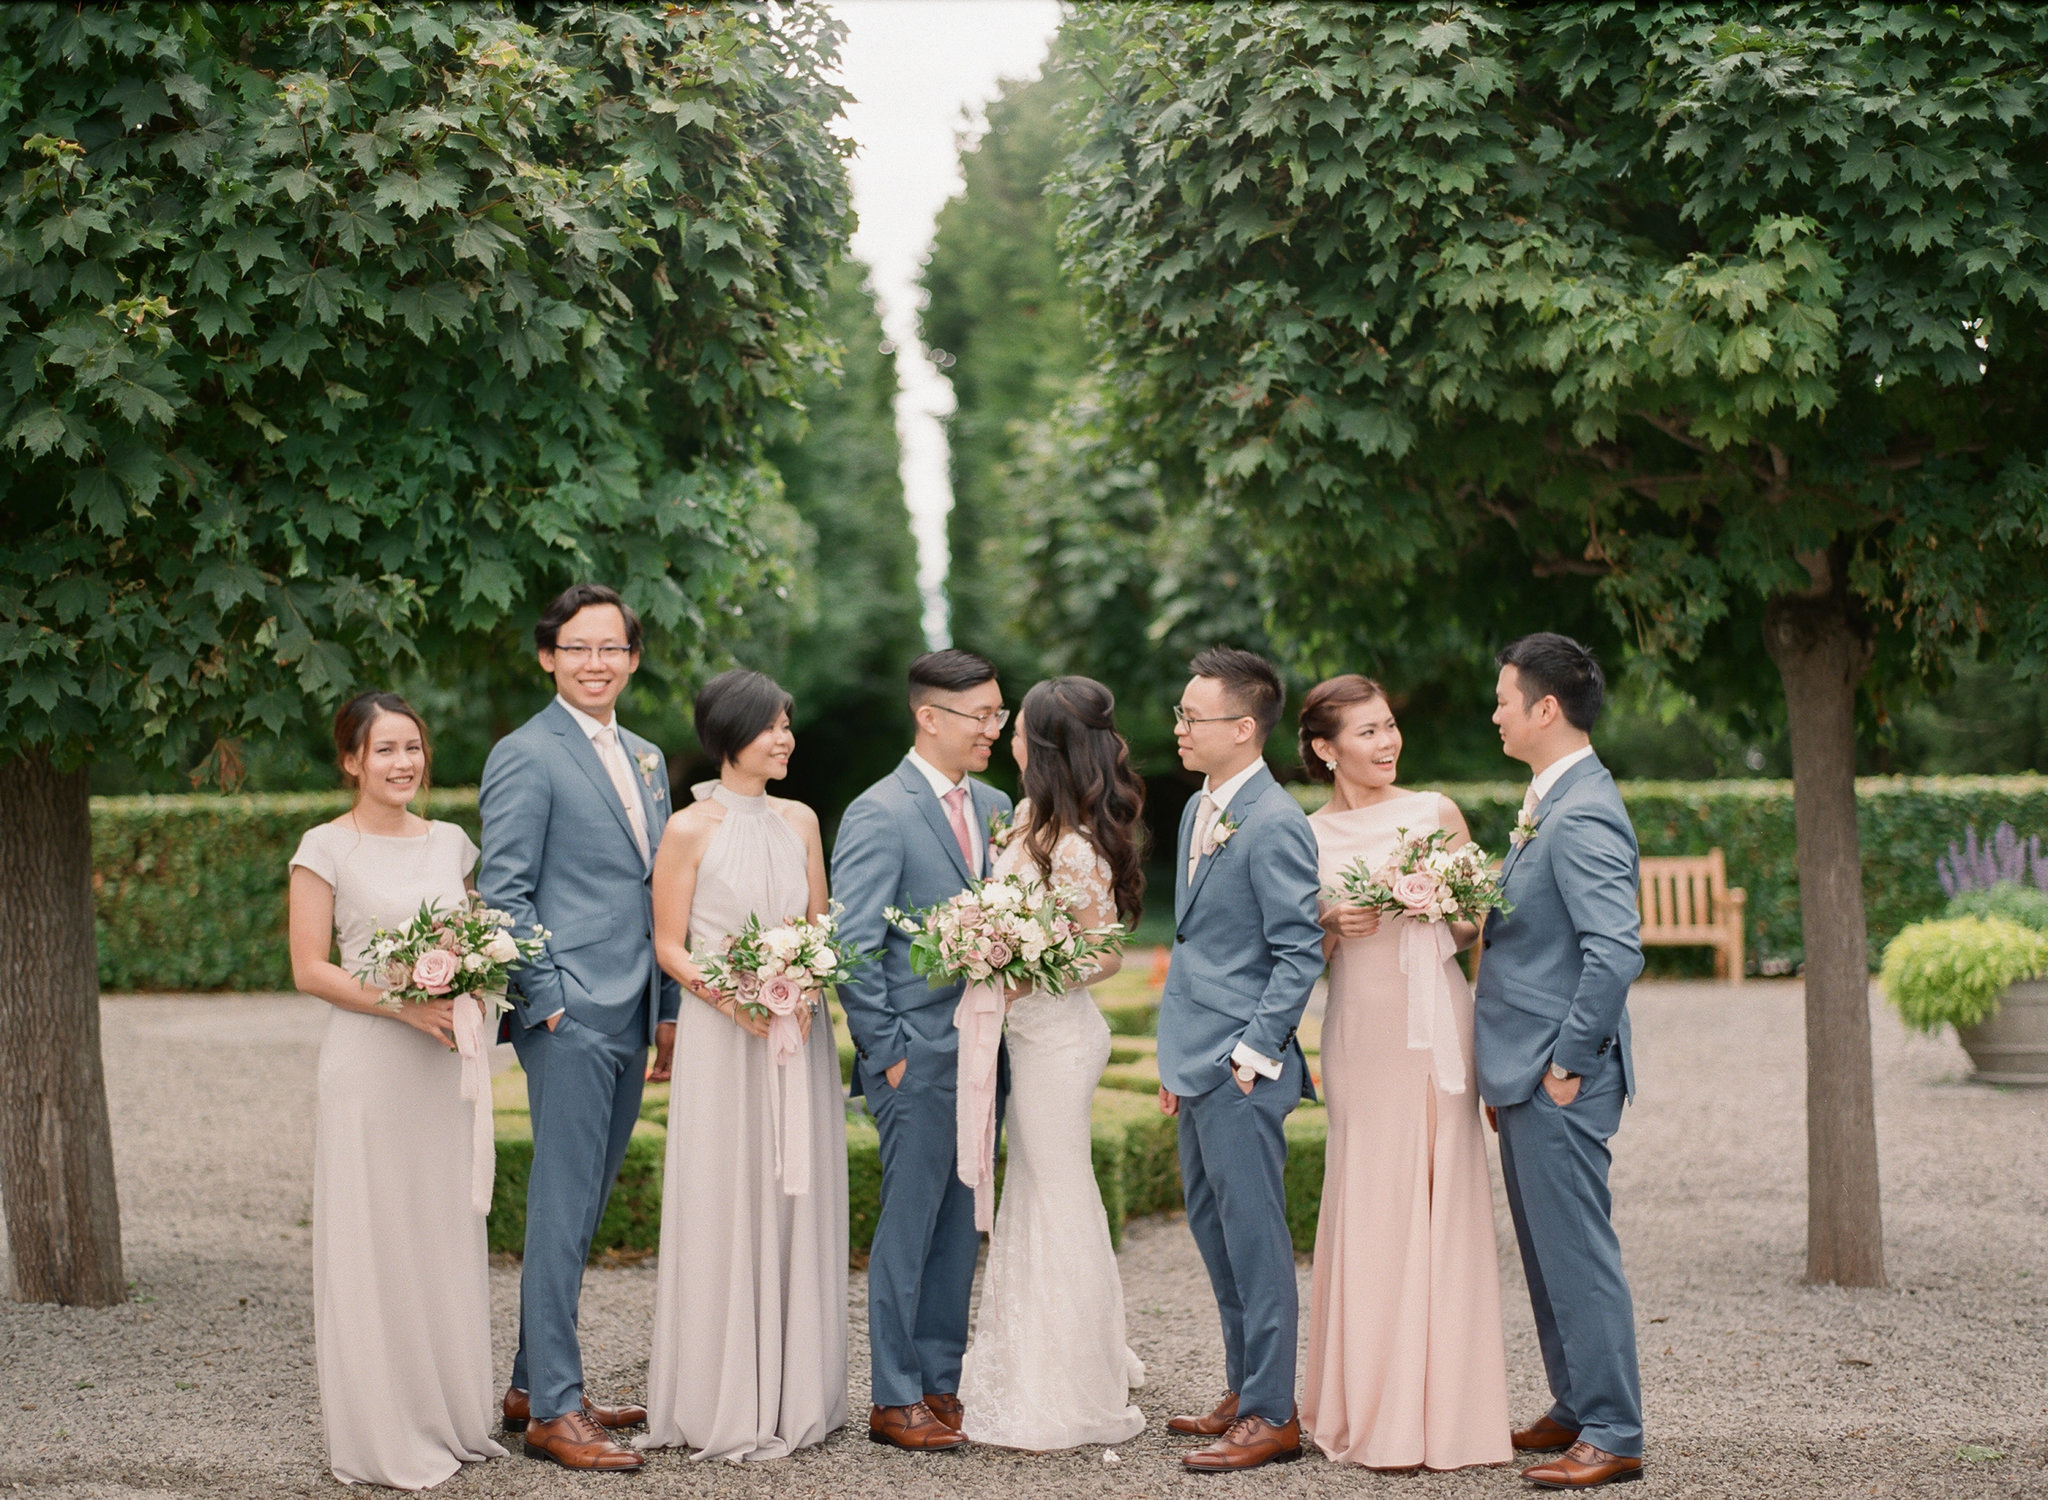 0215-artiese-chateau-des-charmes-wedding-sonia-tim-000095250002.jpg